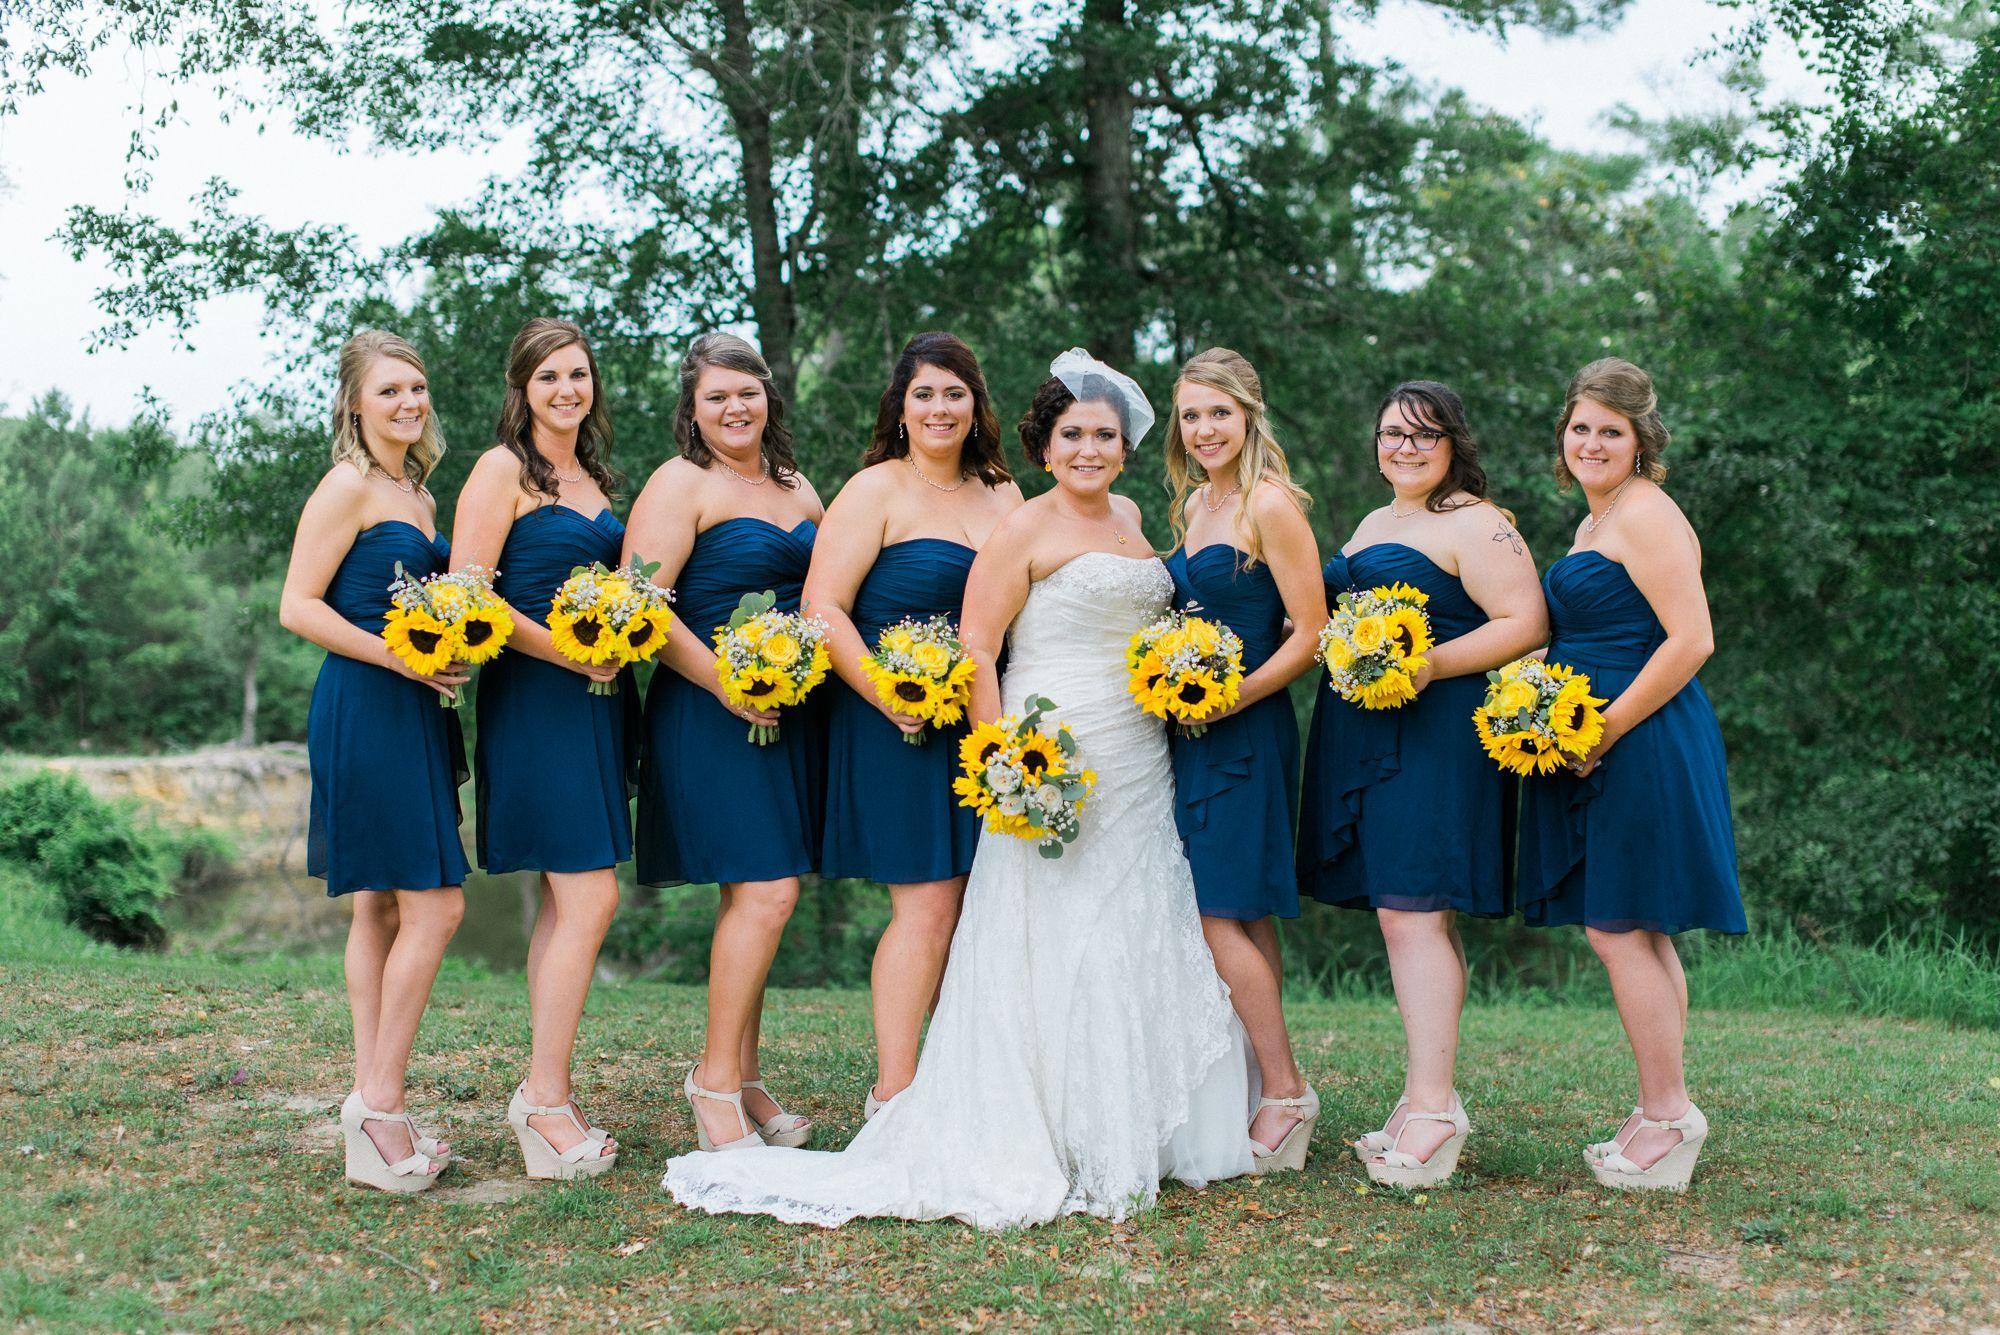 Short Strapless Navy Bridesmaid Dresses